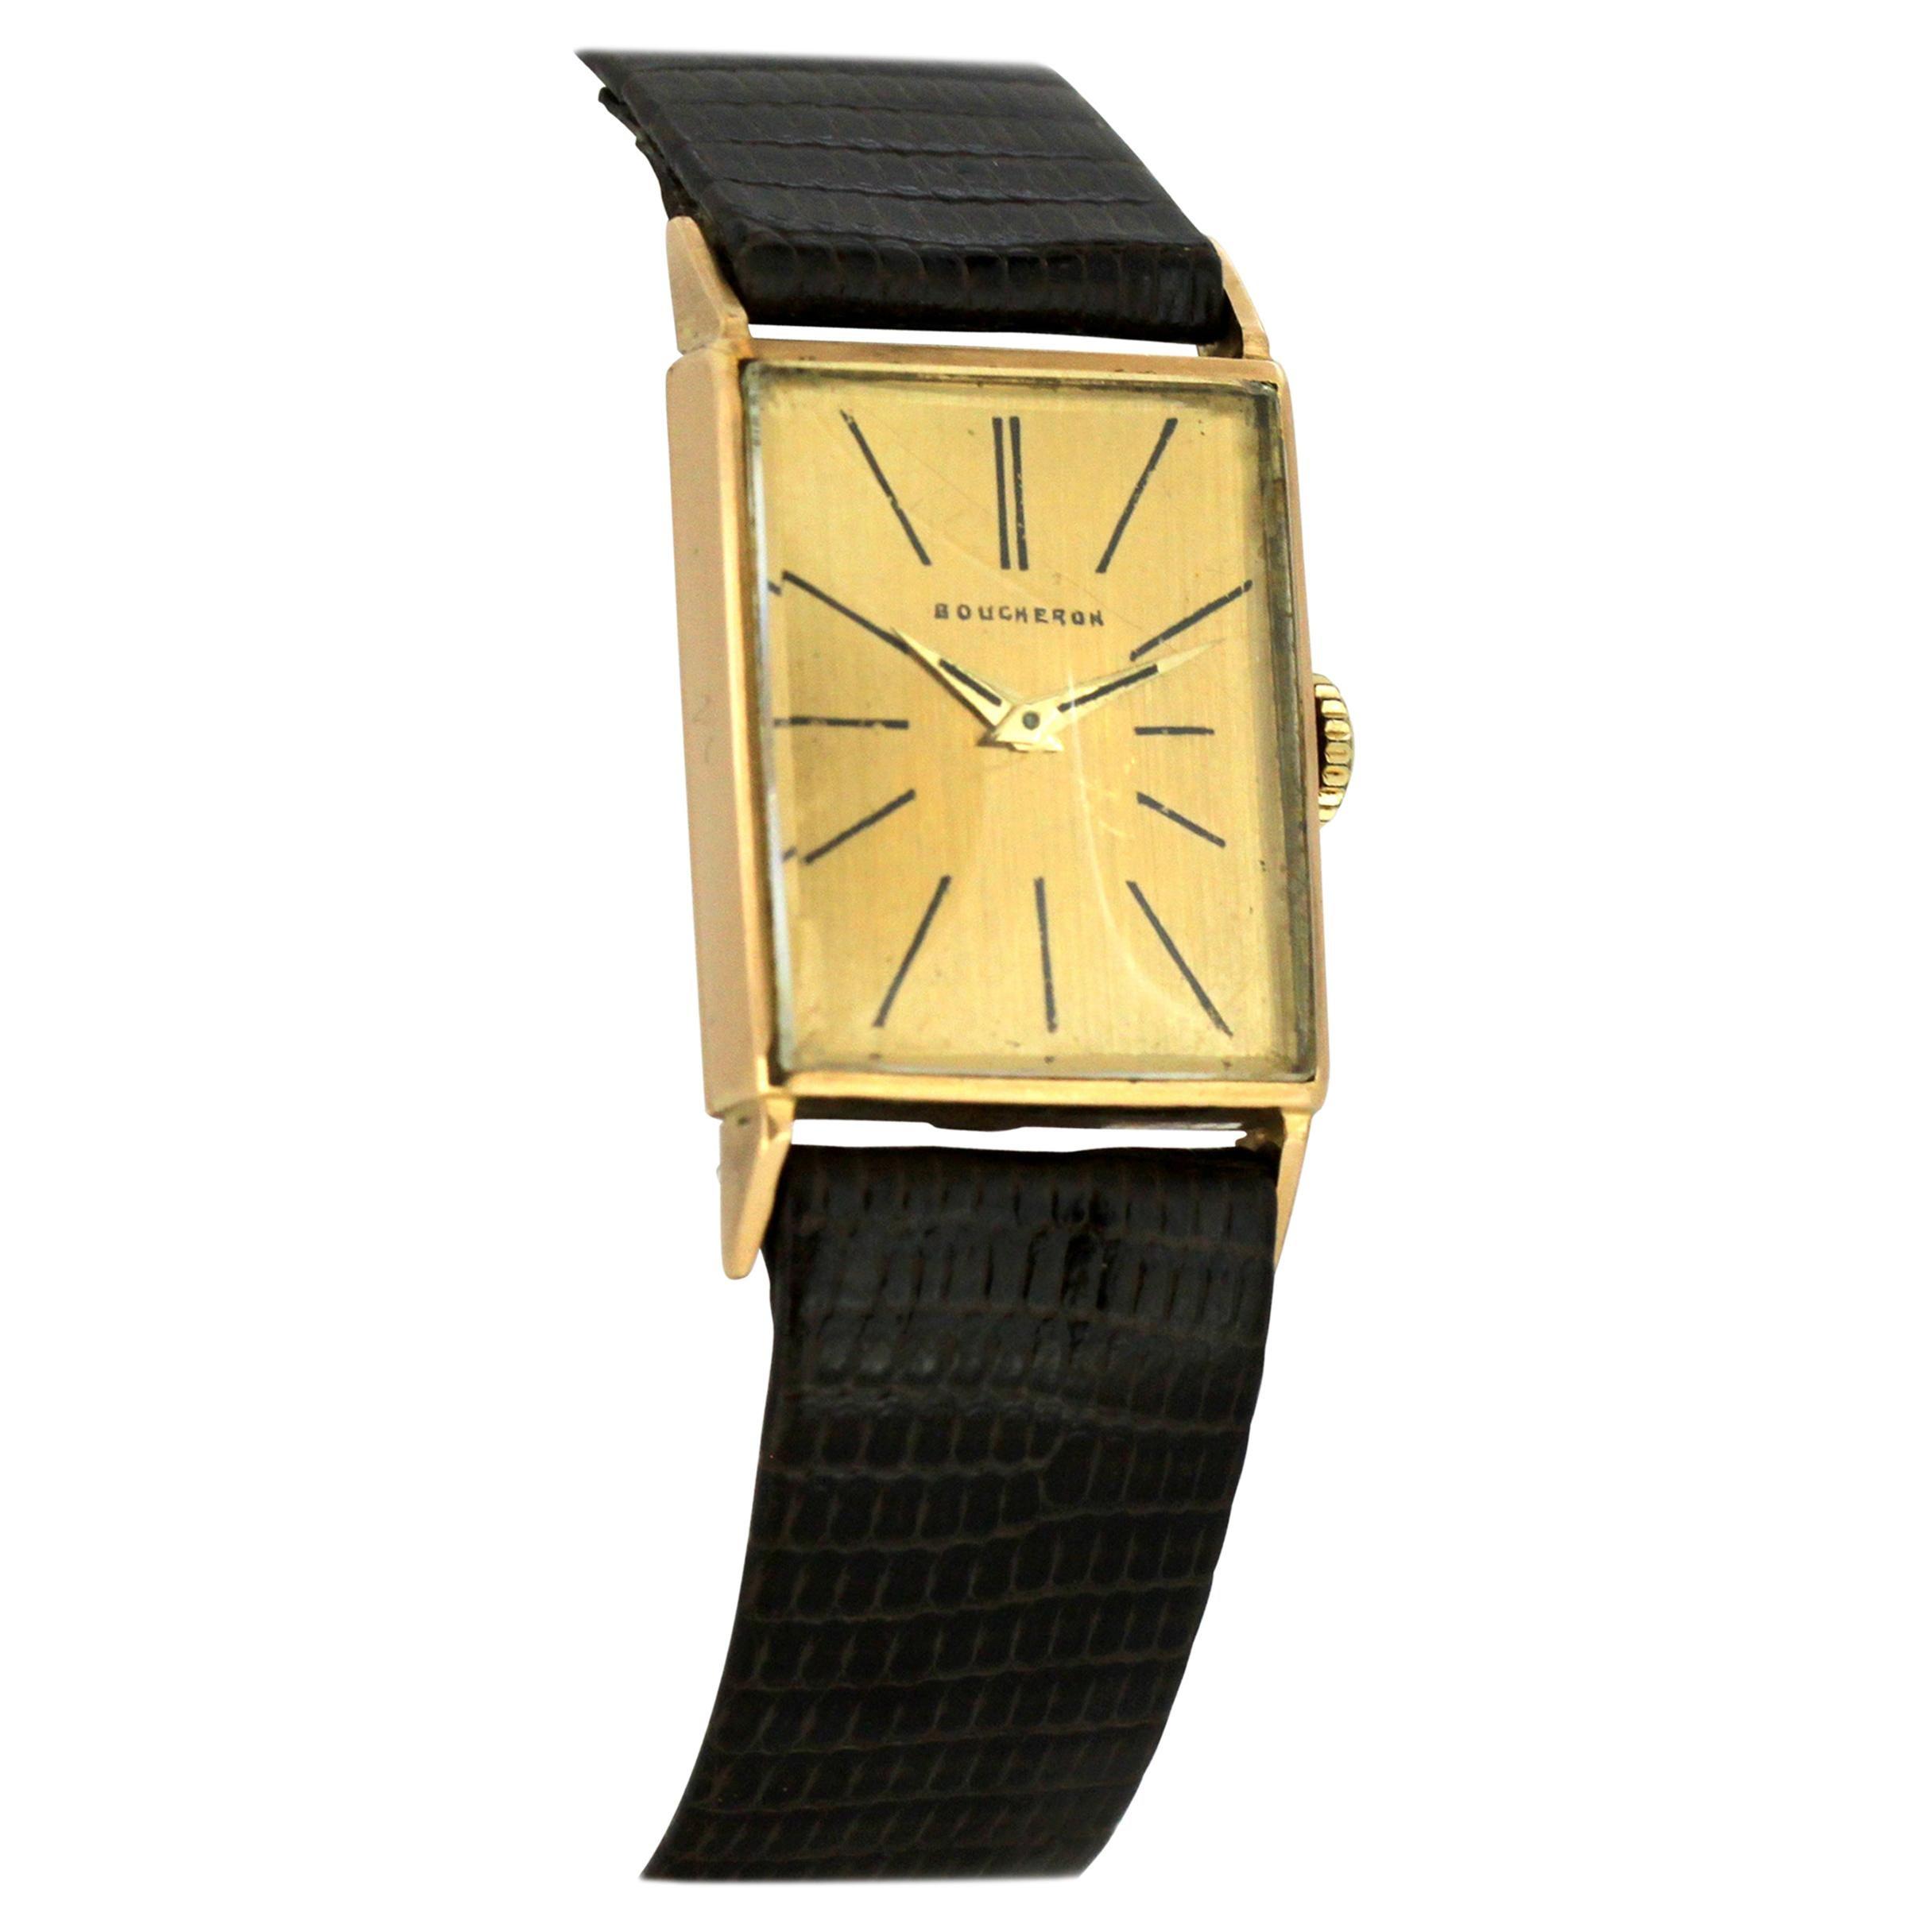 Boucheron Vintage 18 Karat Gold Ladies Watch with Omega Movement, 1960s